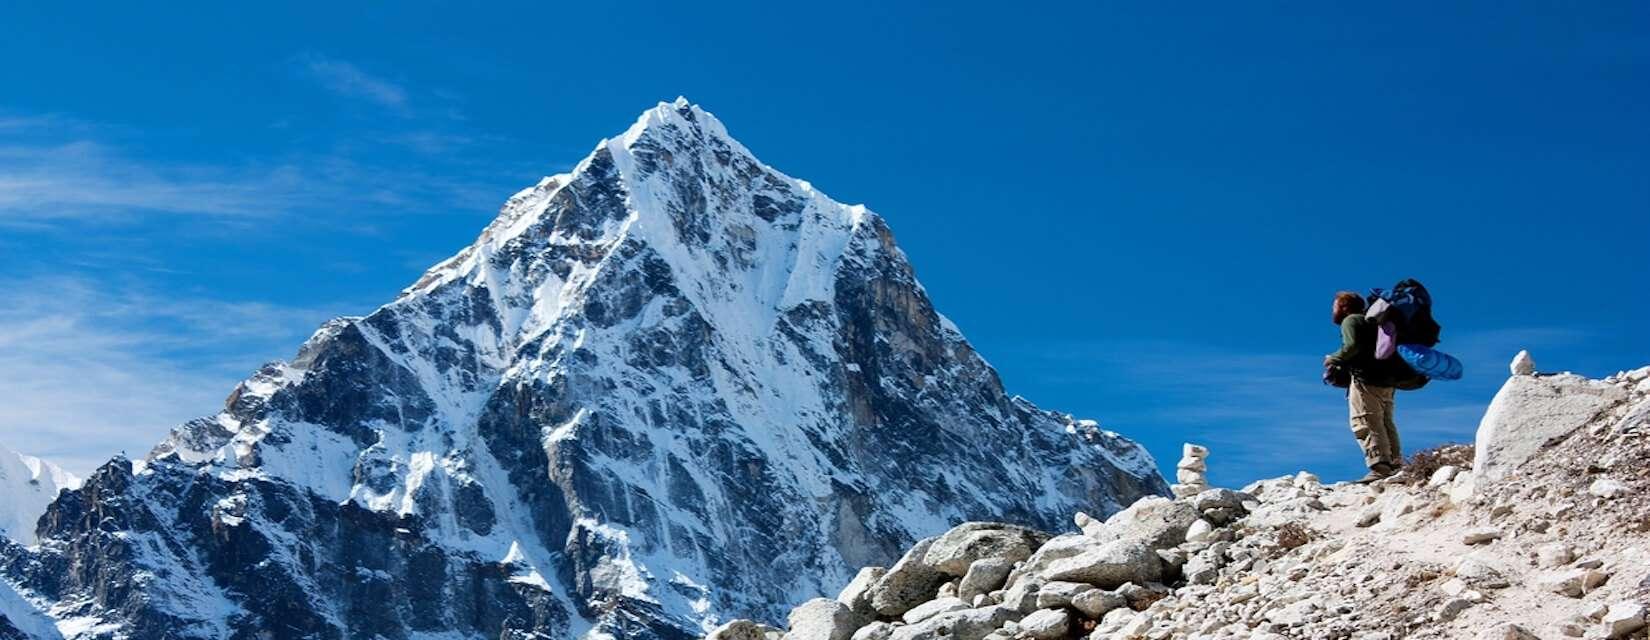 Everest Base Camp Trek from Shivalaya